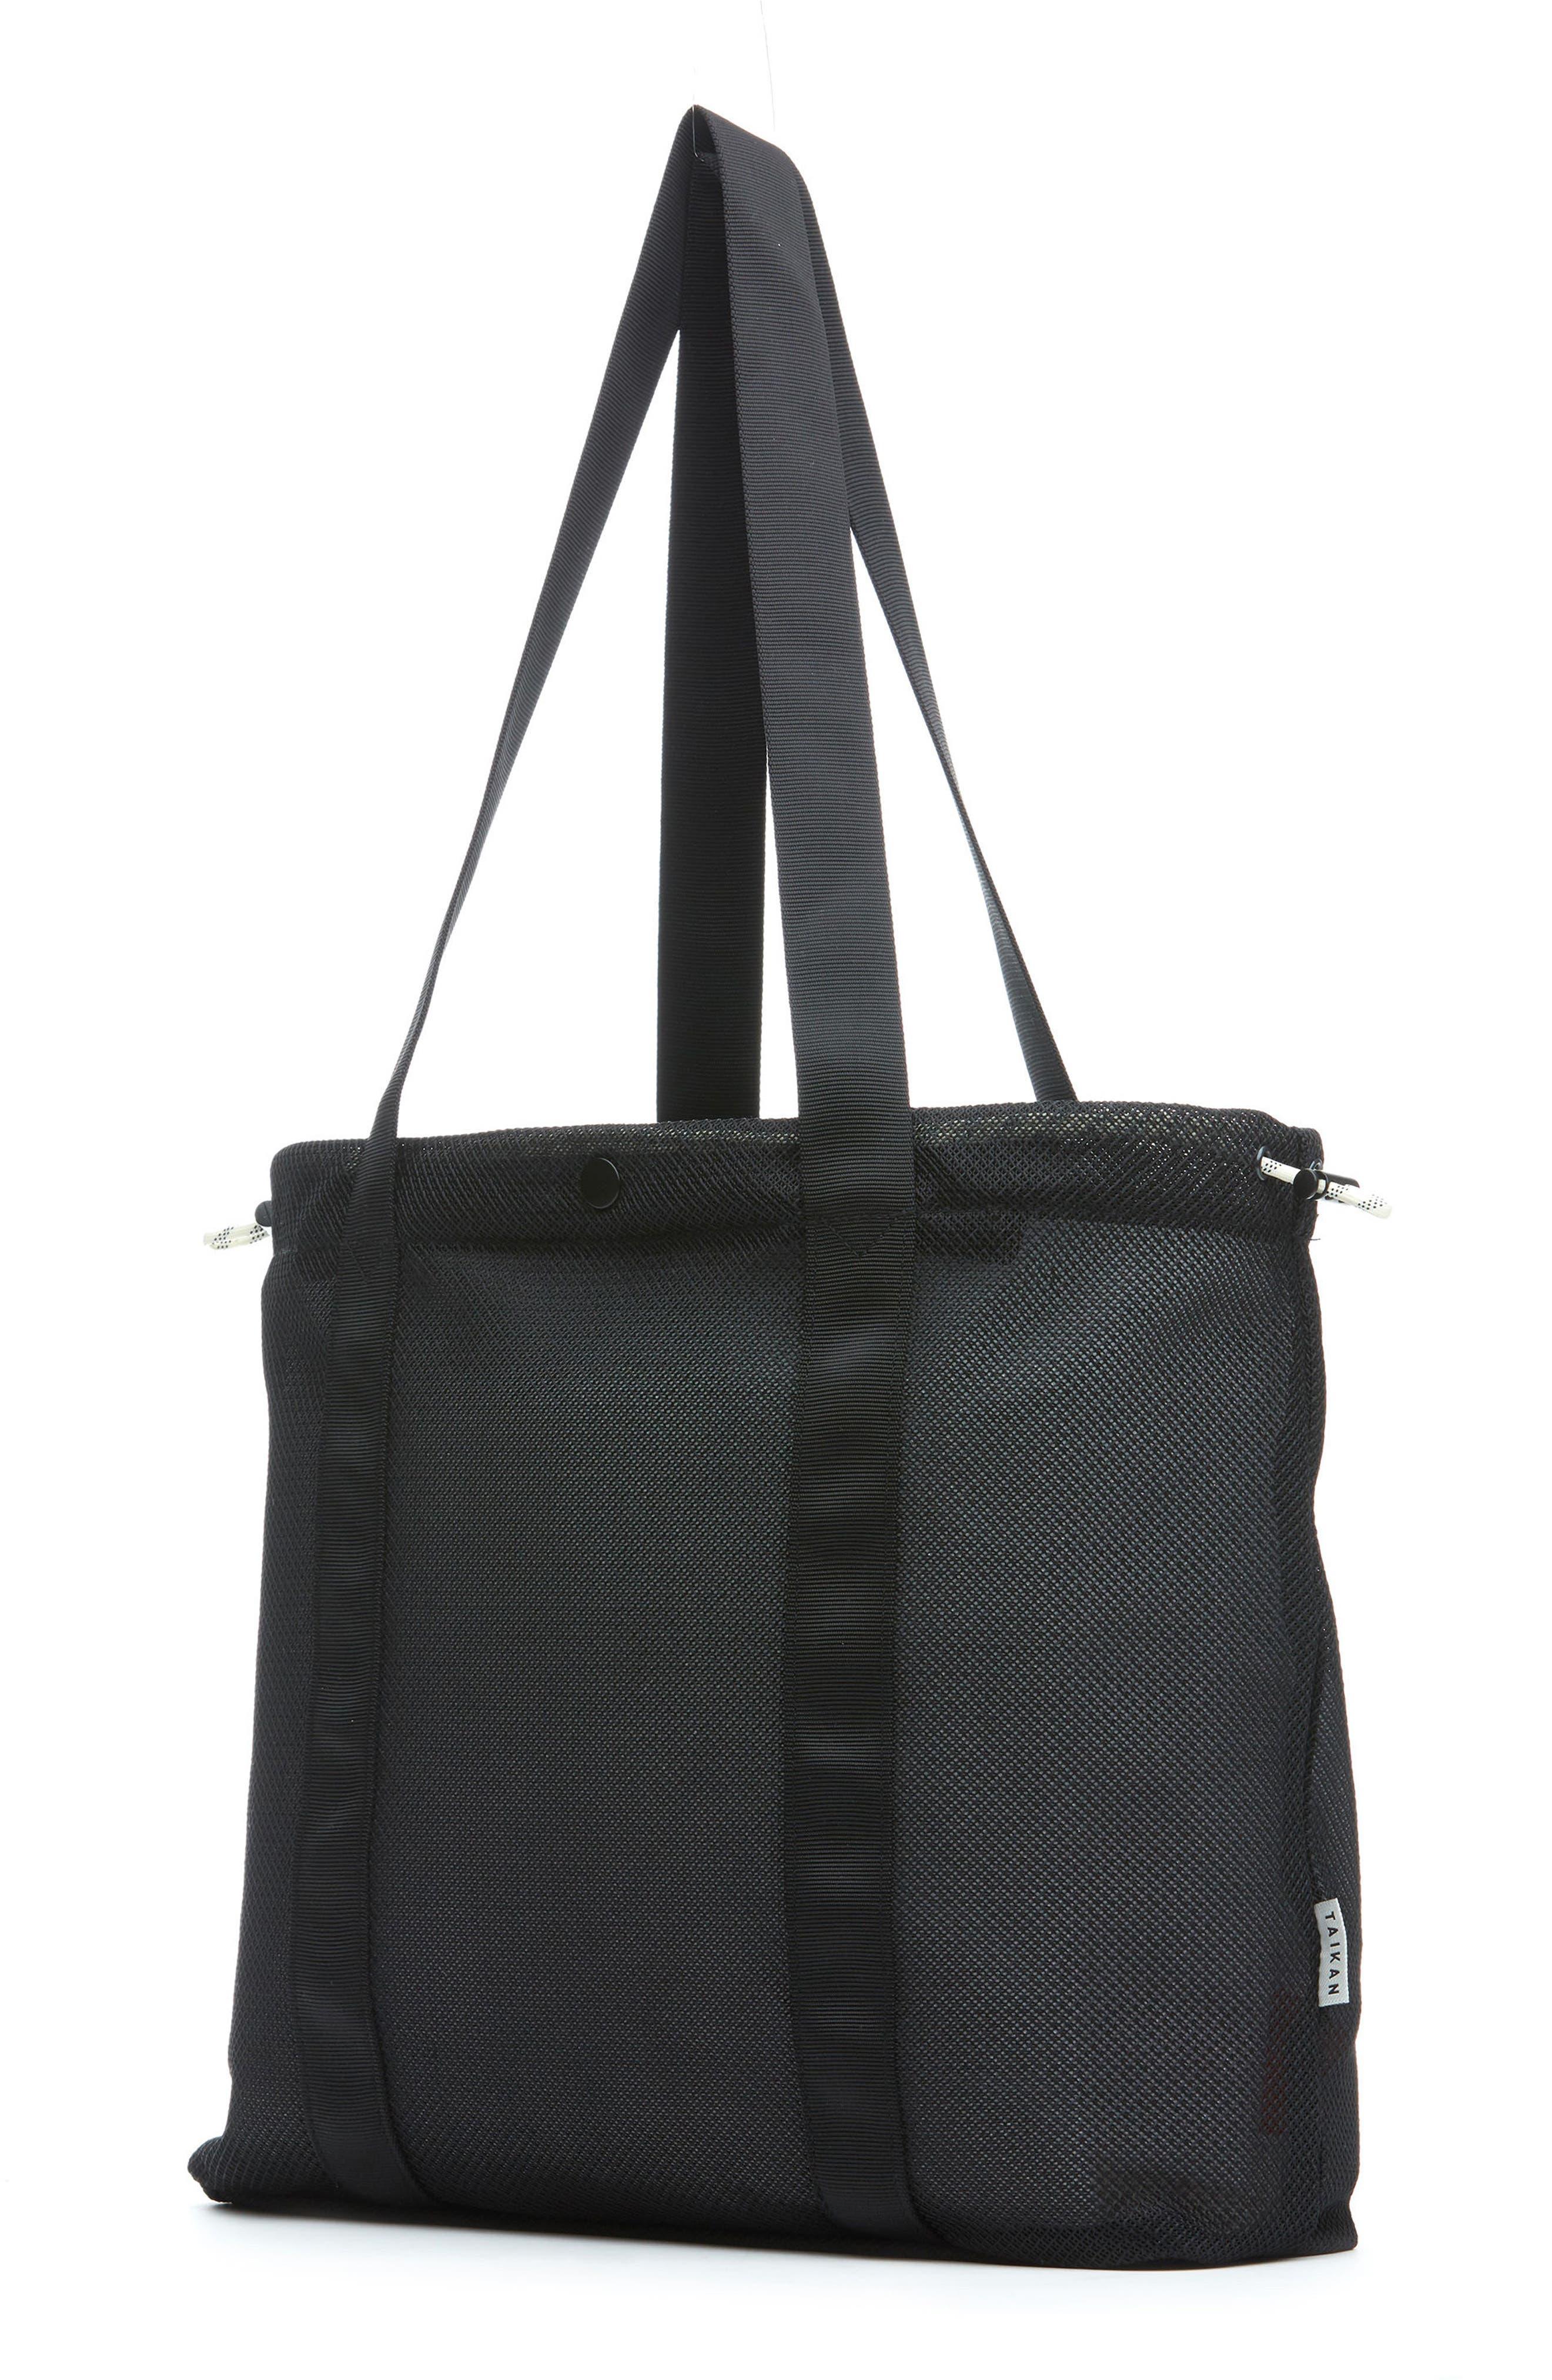 Flanker Mesh Tote Bag,                             Alternate thumbnail 2, color,                             Black Mesh